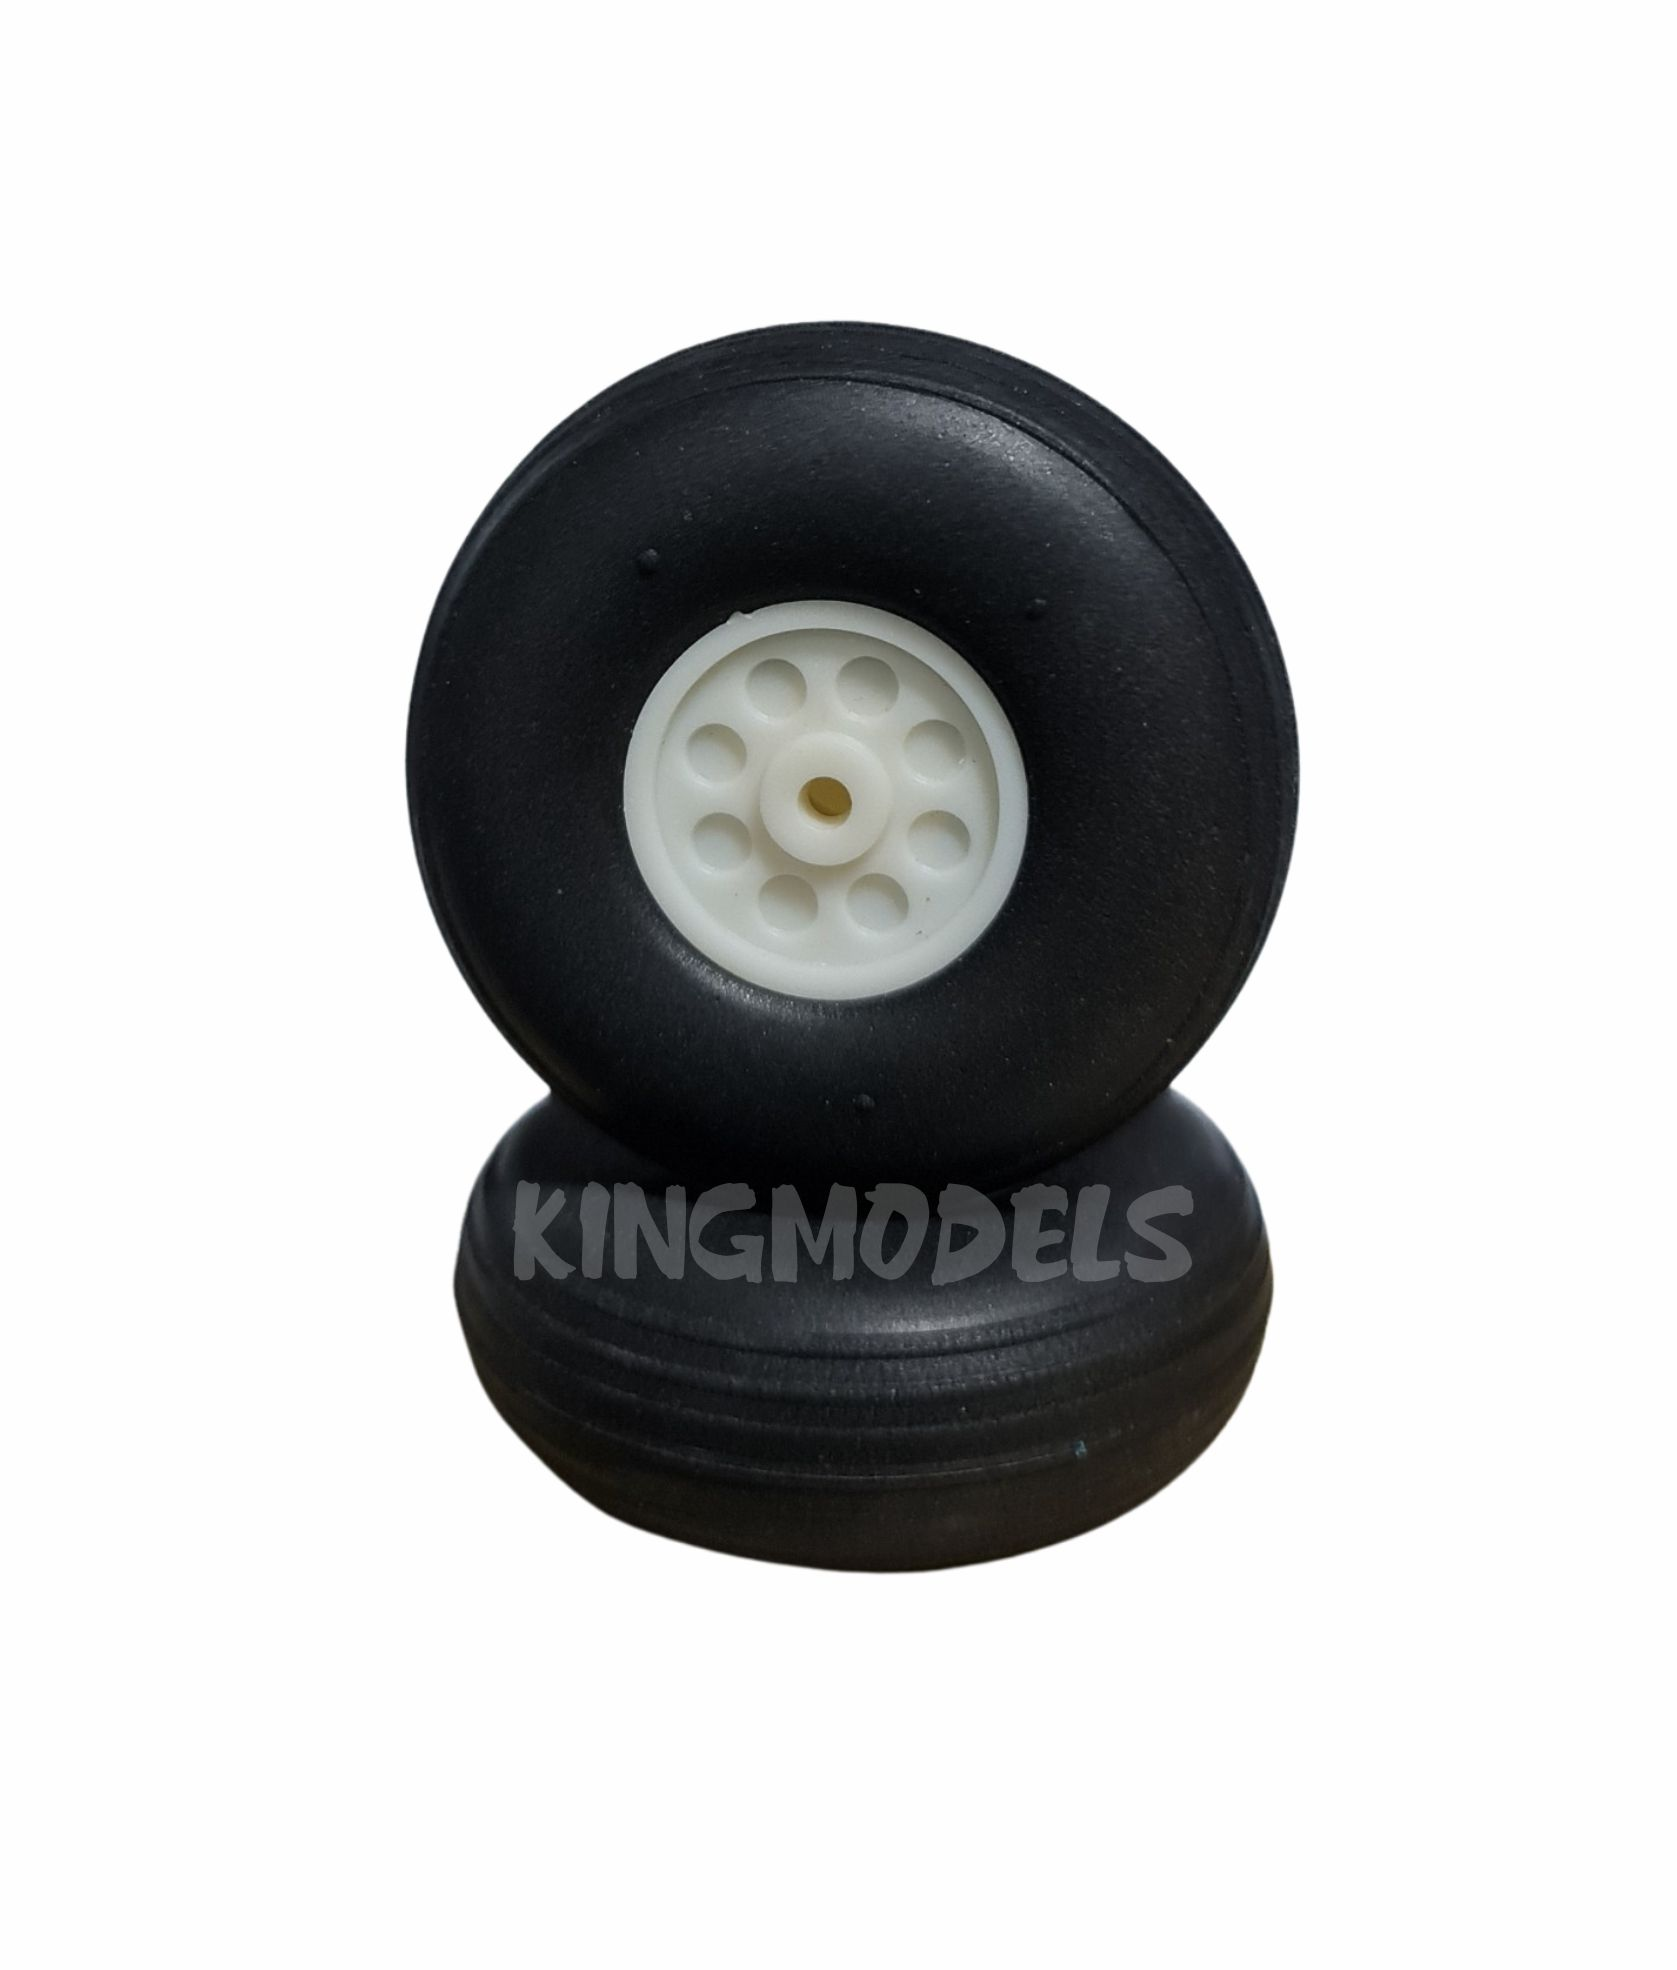 Roda De Borracha Extra-leve E Cubo Nylon-38mm-Aerodinâmica (2pçs)  - King Models